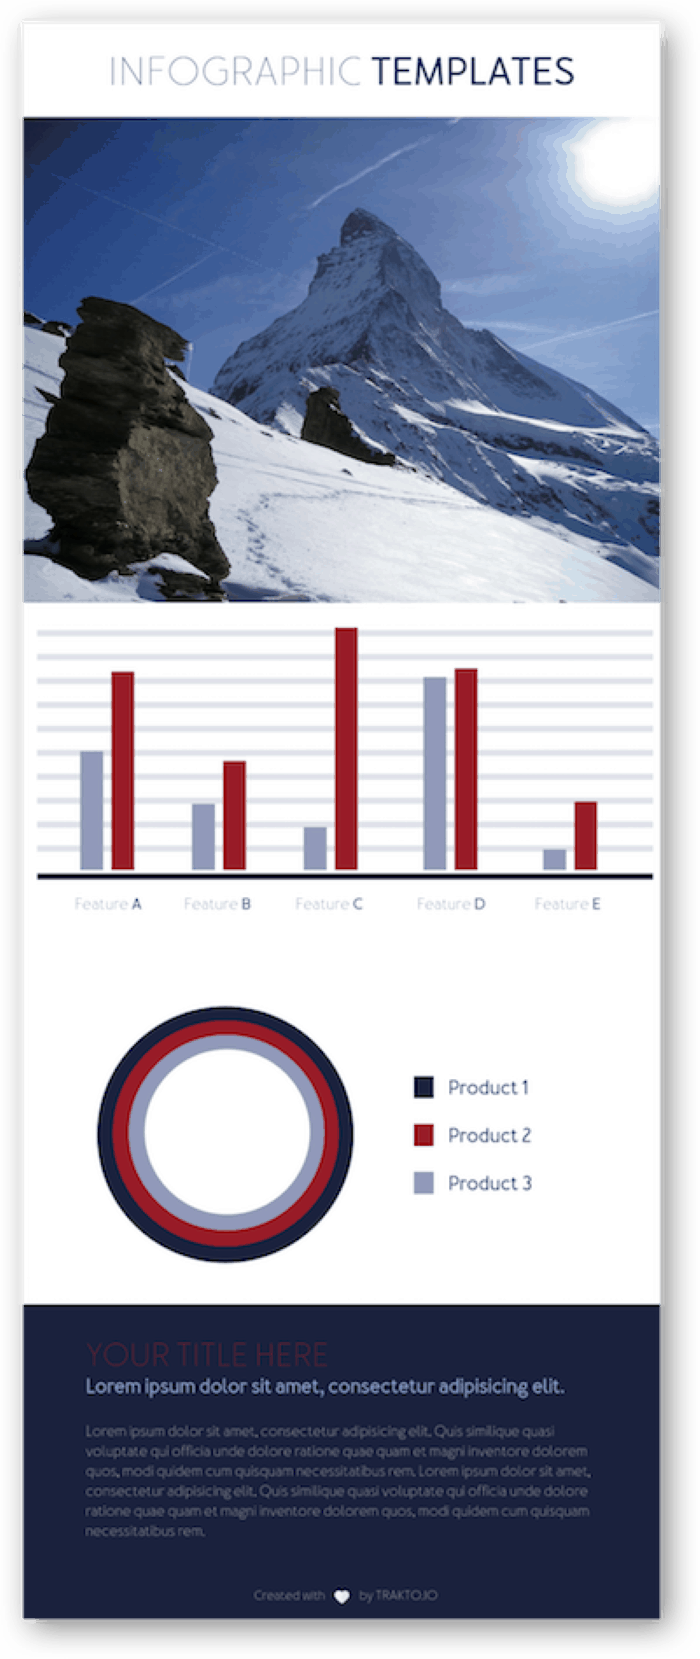 comoconstruirinfograficos11 - Como construir infográficos surpreendentes para o seu negócio?